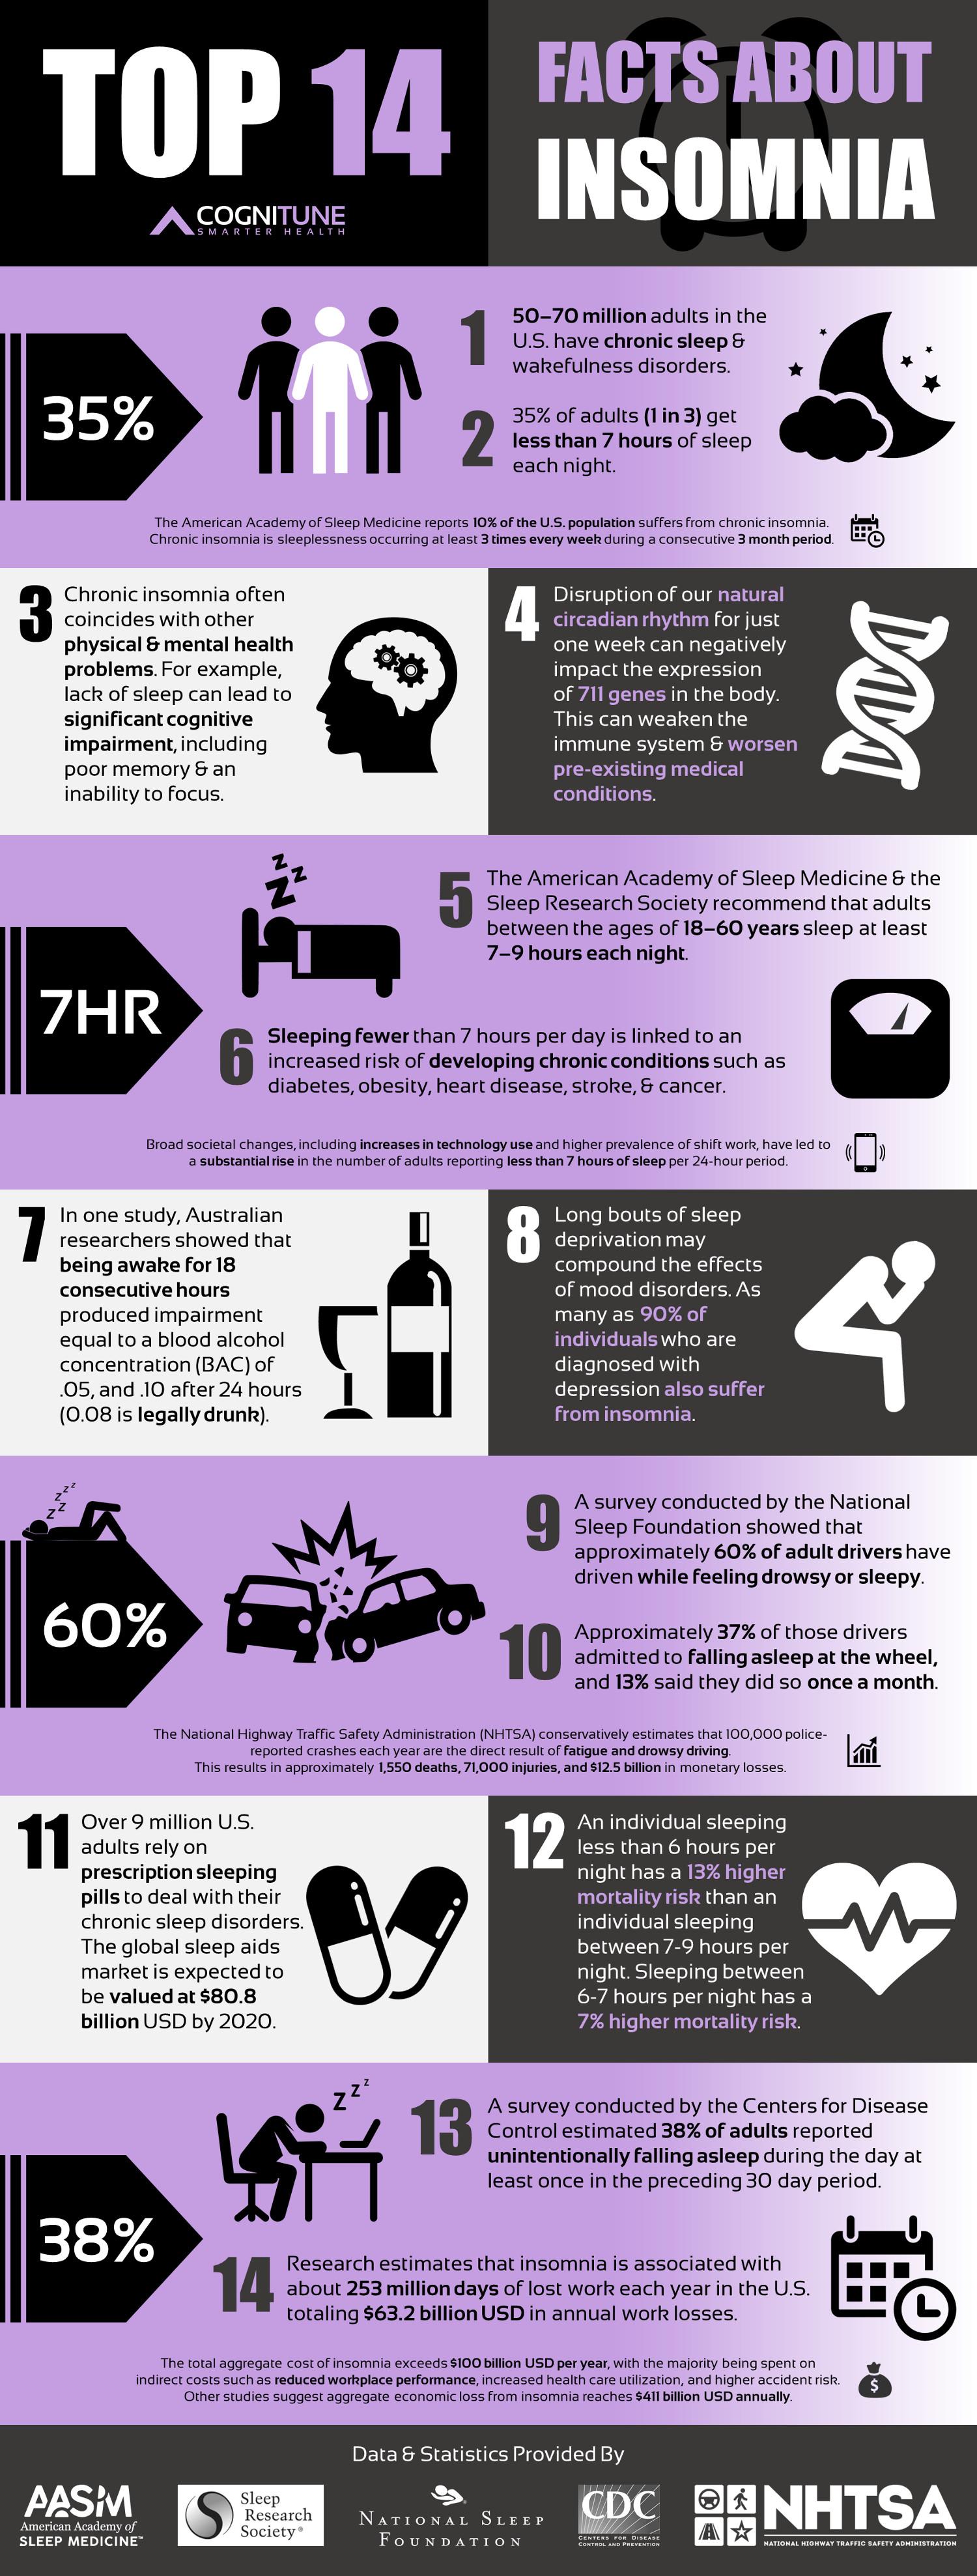 sleep-insomnia-statistics-infographic.jpg